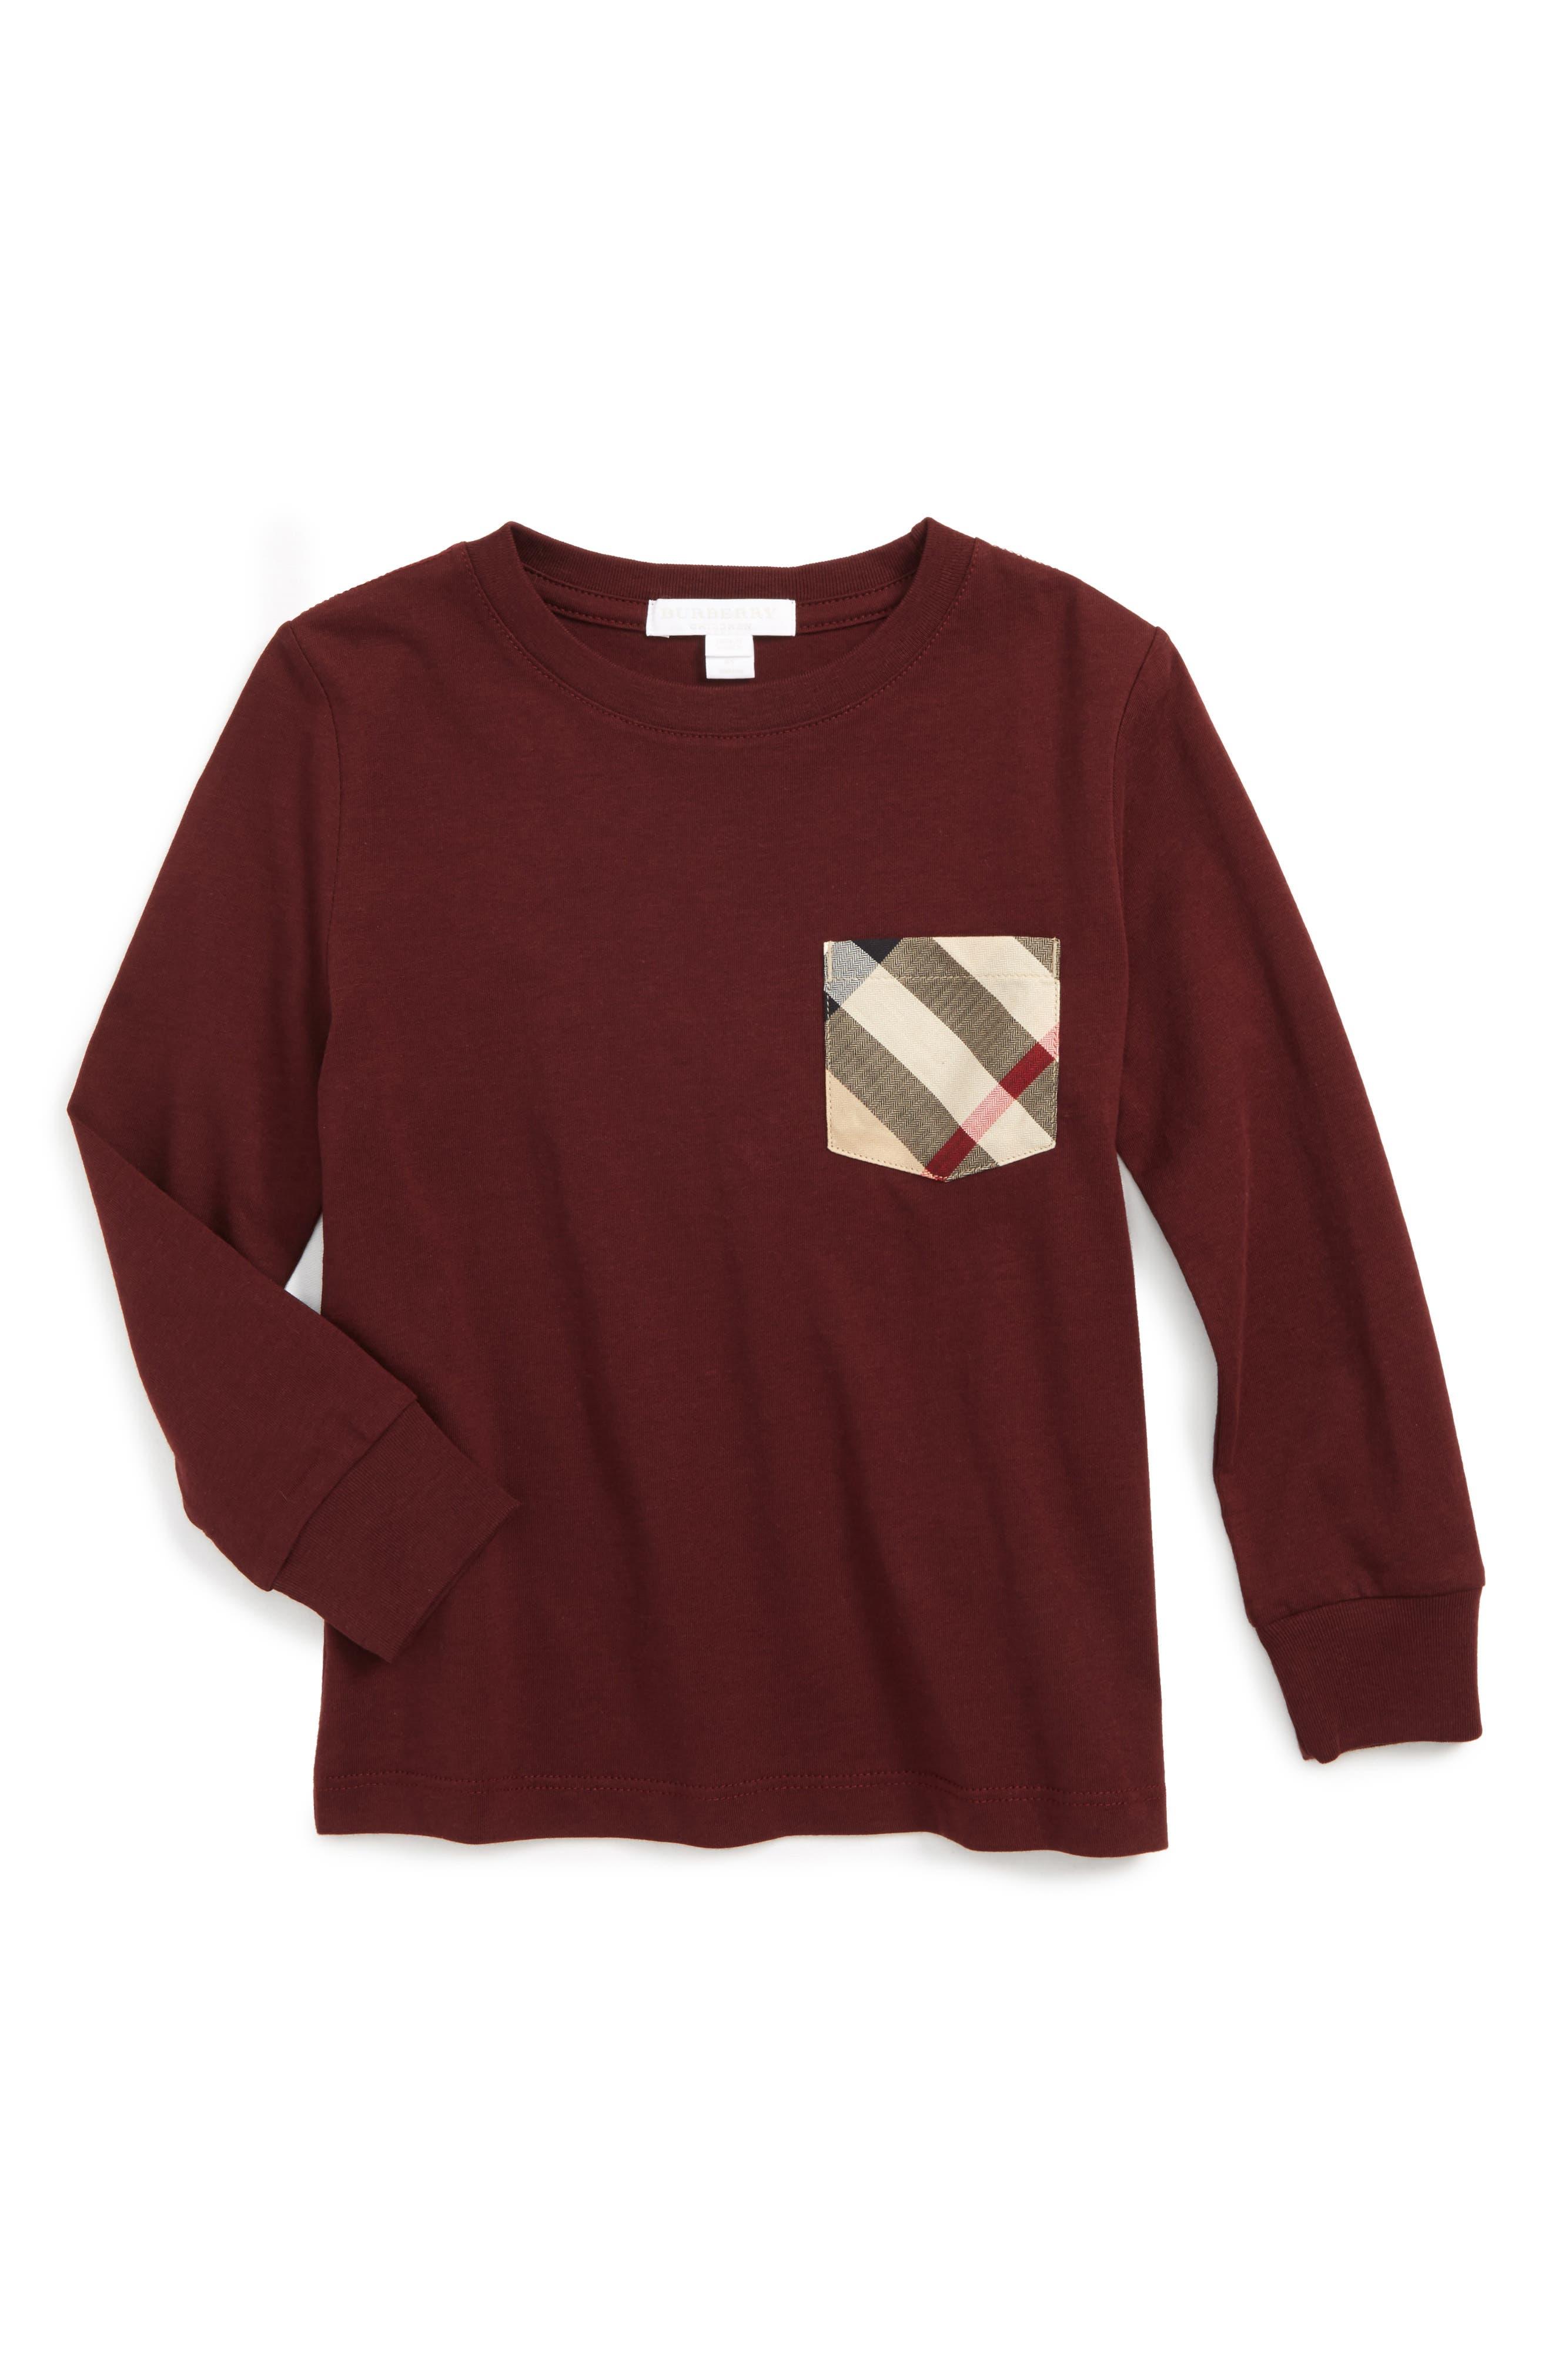 BURBERRY Check Print Chest Pocket T-Shirt